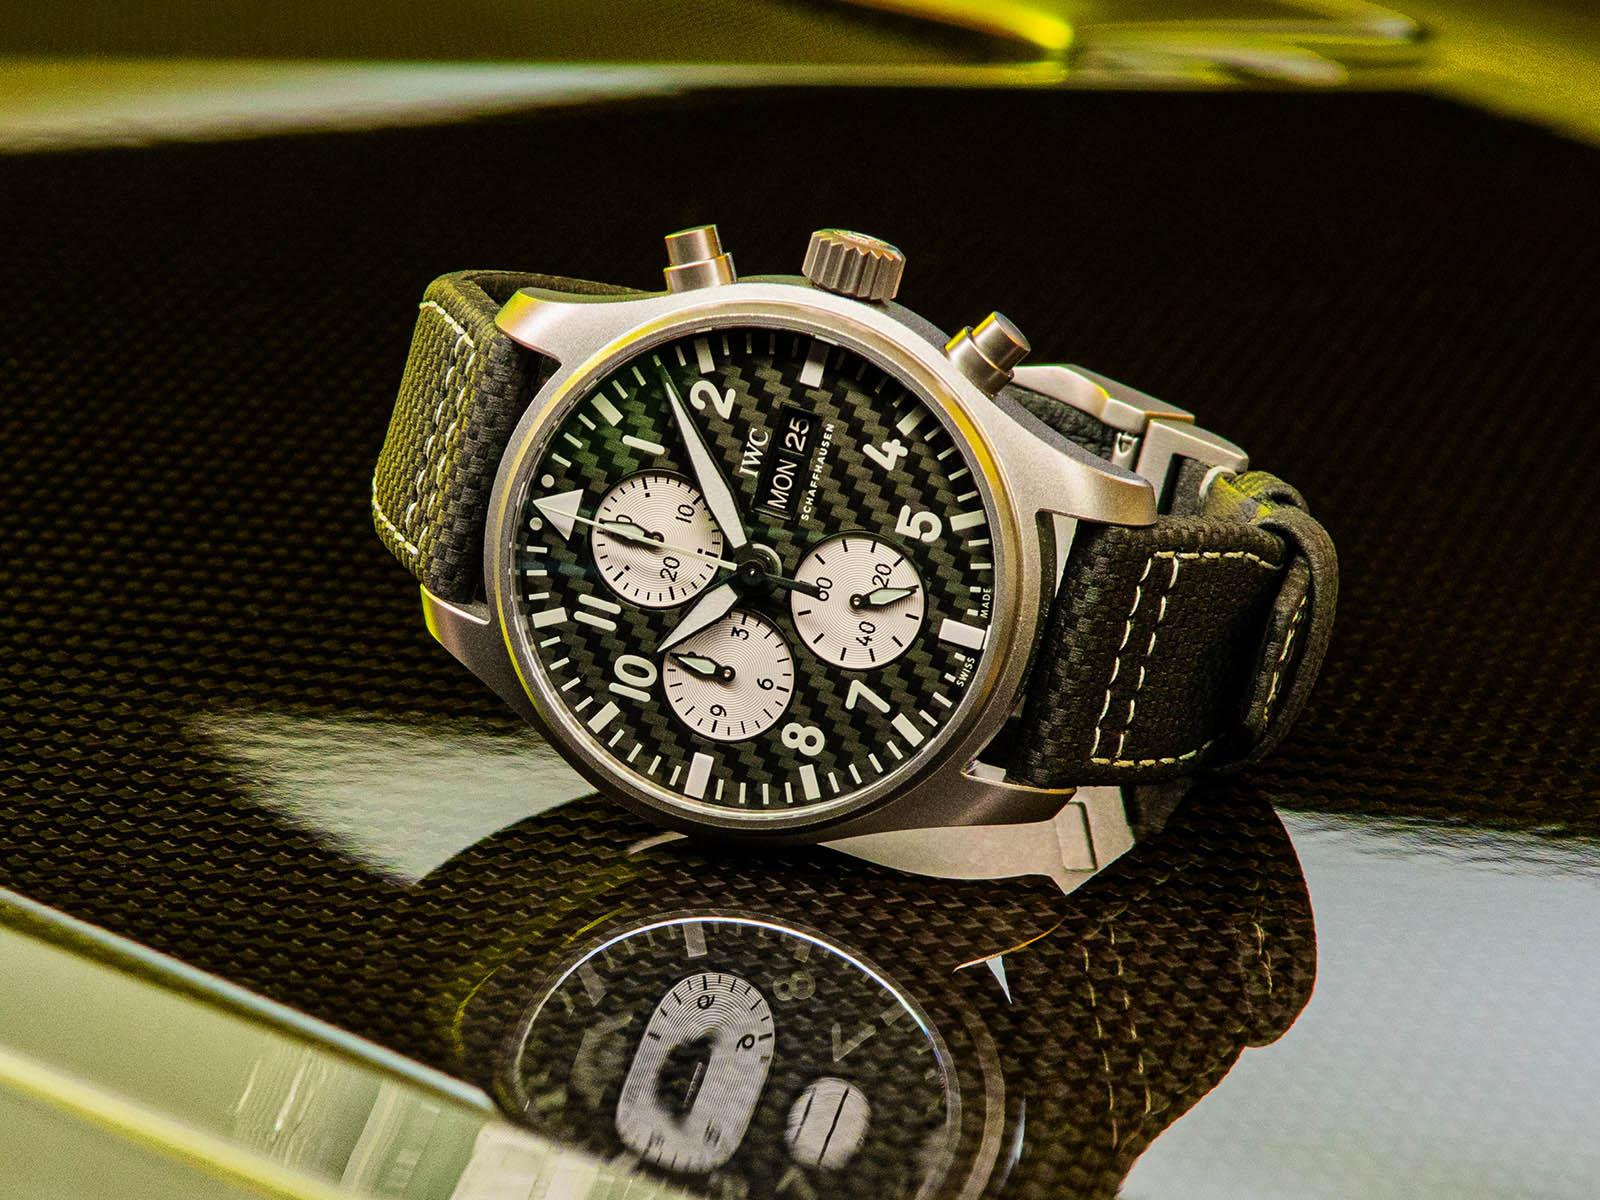 iw377903-iwc-pilot-s-watch-chronograph-edition-amg-3.jpg